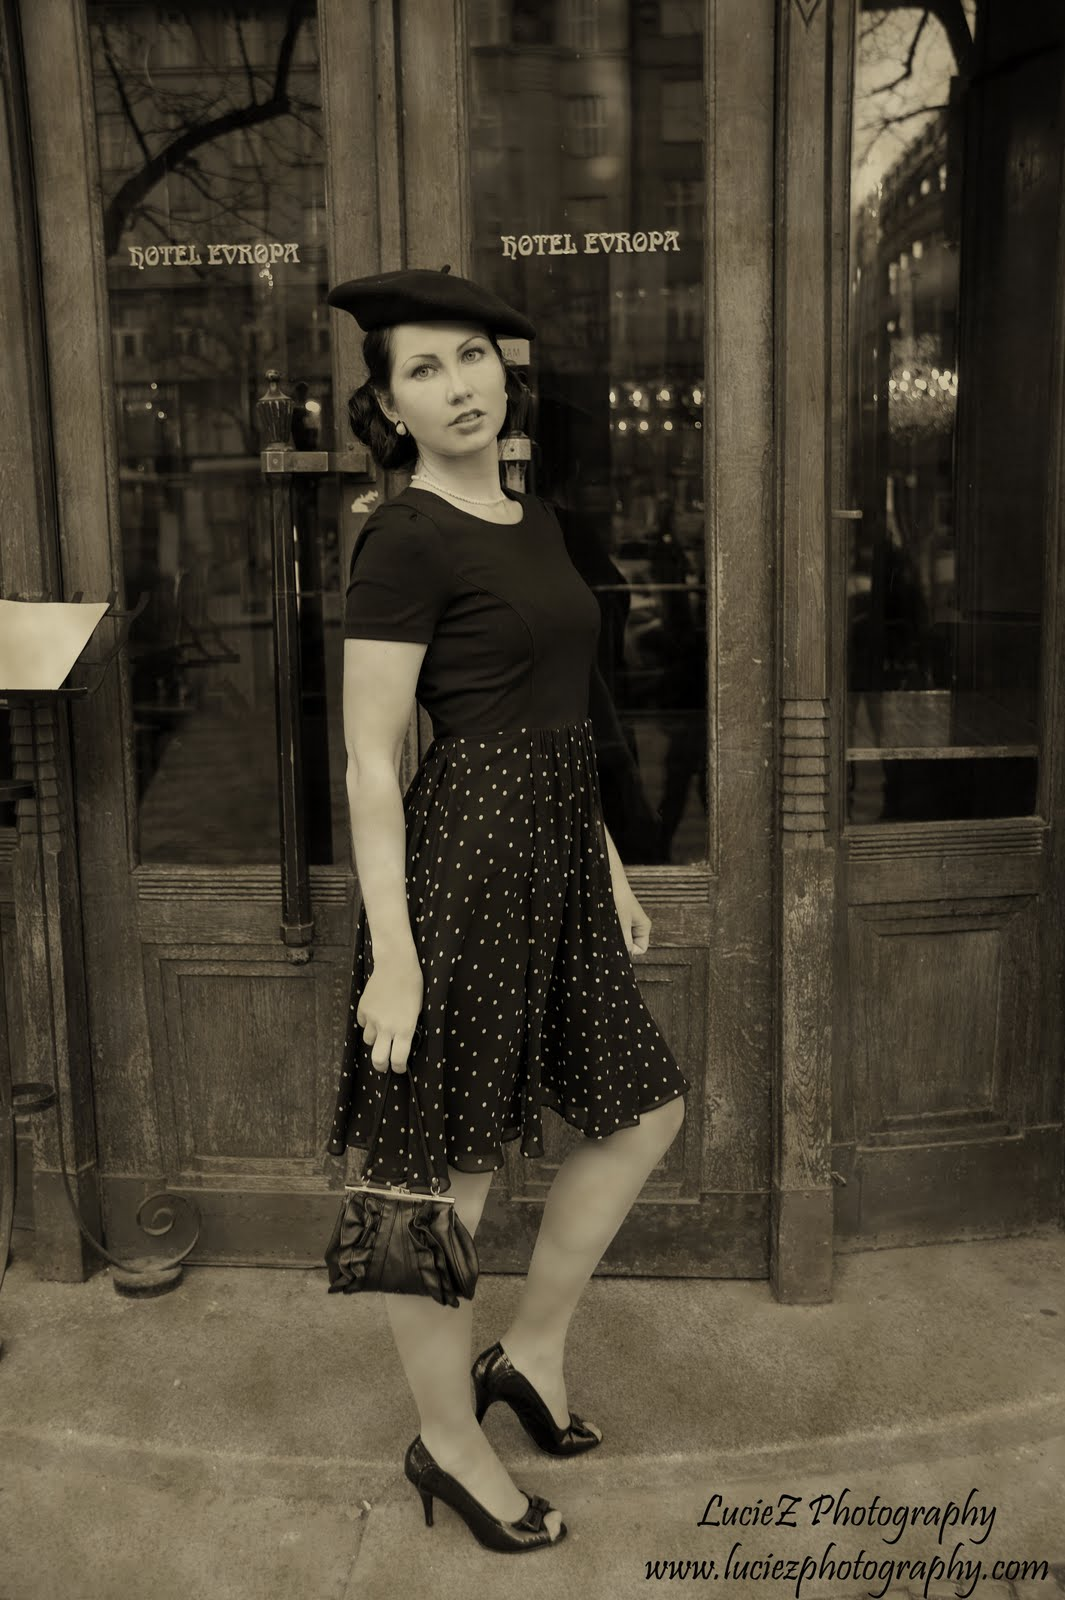 LUCIEZ PHOTOGRAPHY: Fashion Of The 30s Photoshoot / Moda